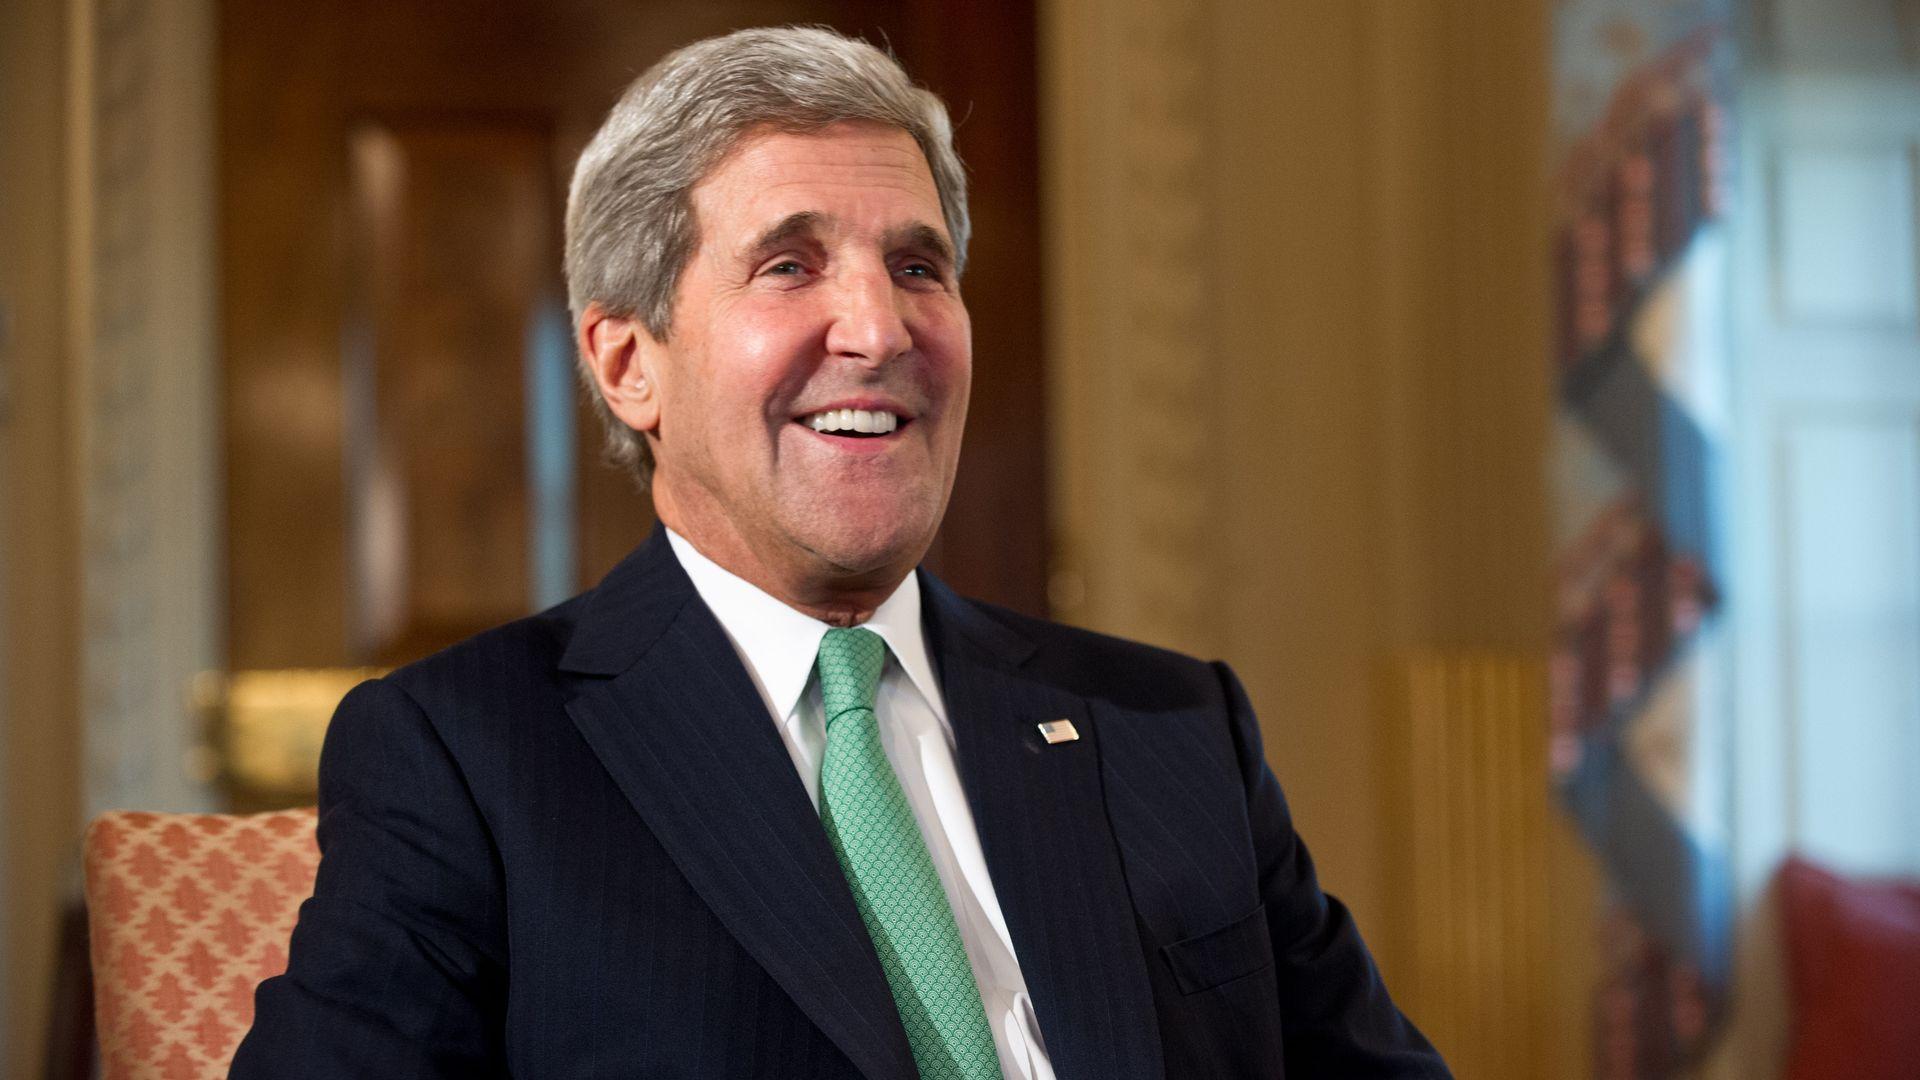 Trump's license plates and Roger Stone's handcuffs: John Kerry's best Alfalfa dinner jokes